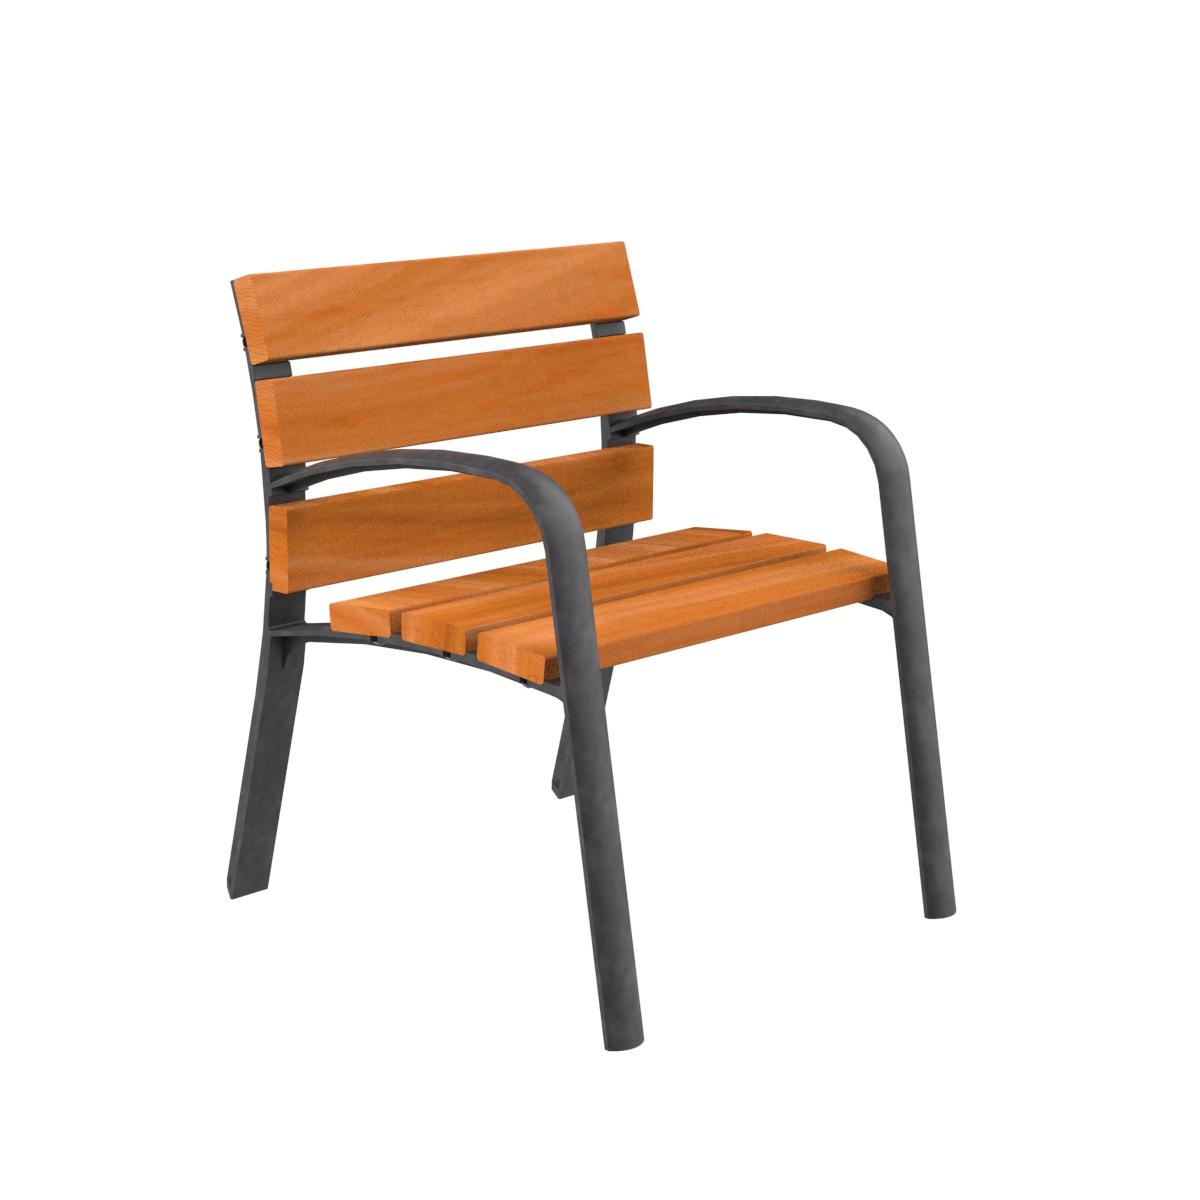 Silla madera modo mobiliario urbano para sentarse parques for Sillas para parques